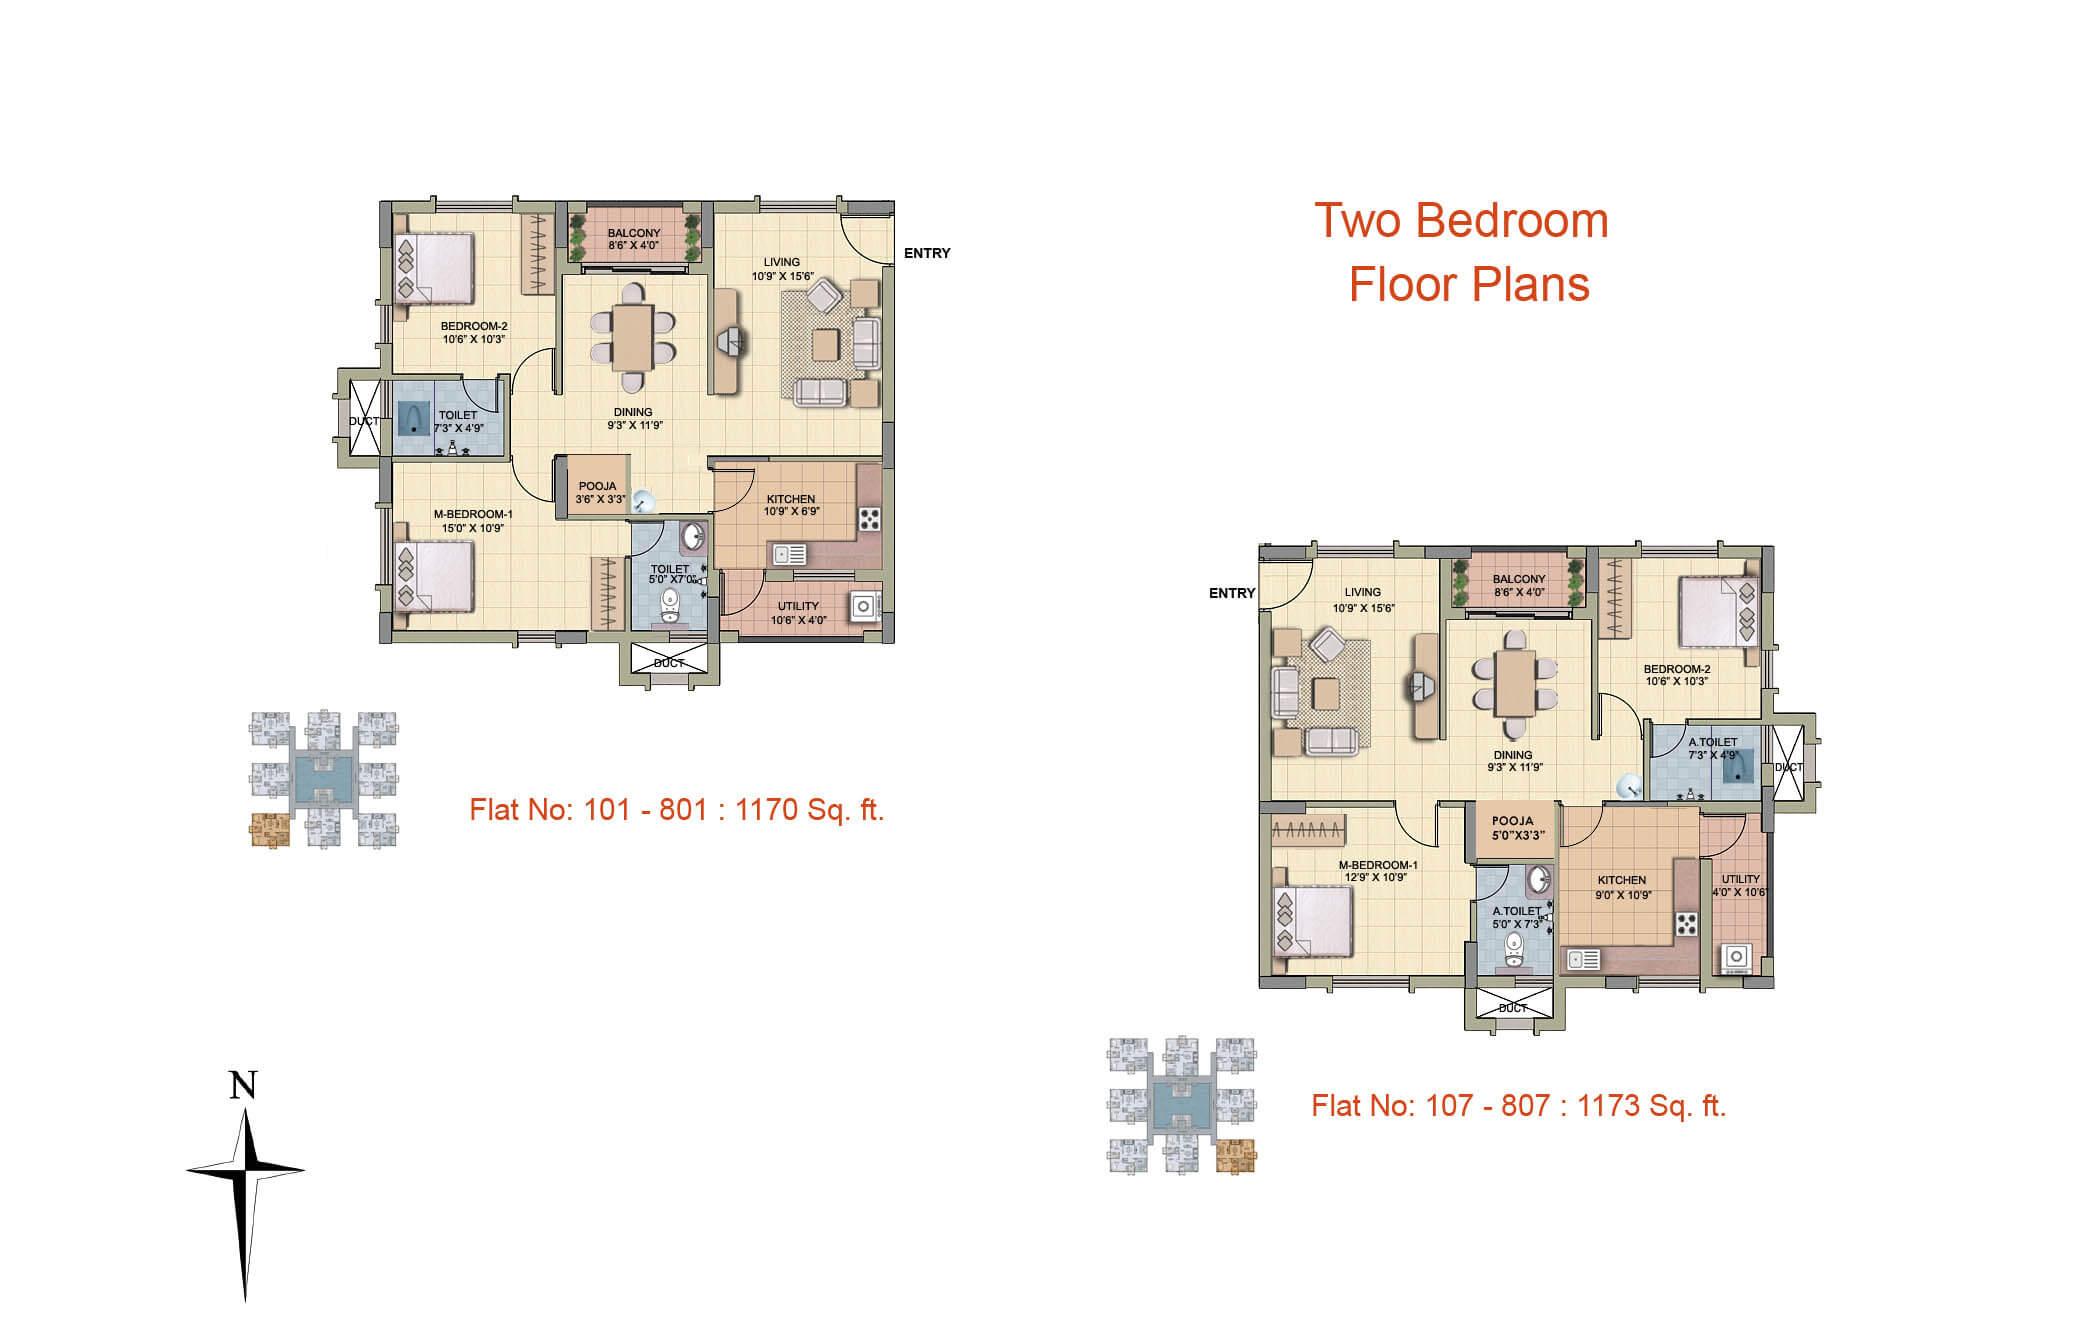 1170 sq ft - 1173 sq ft